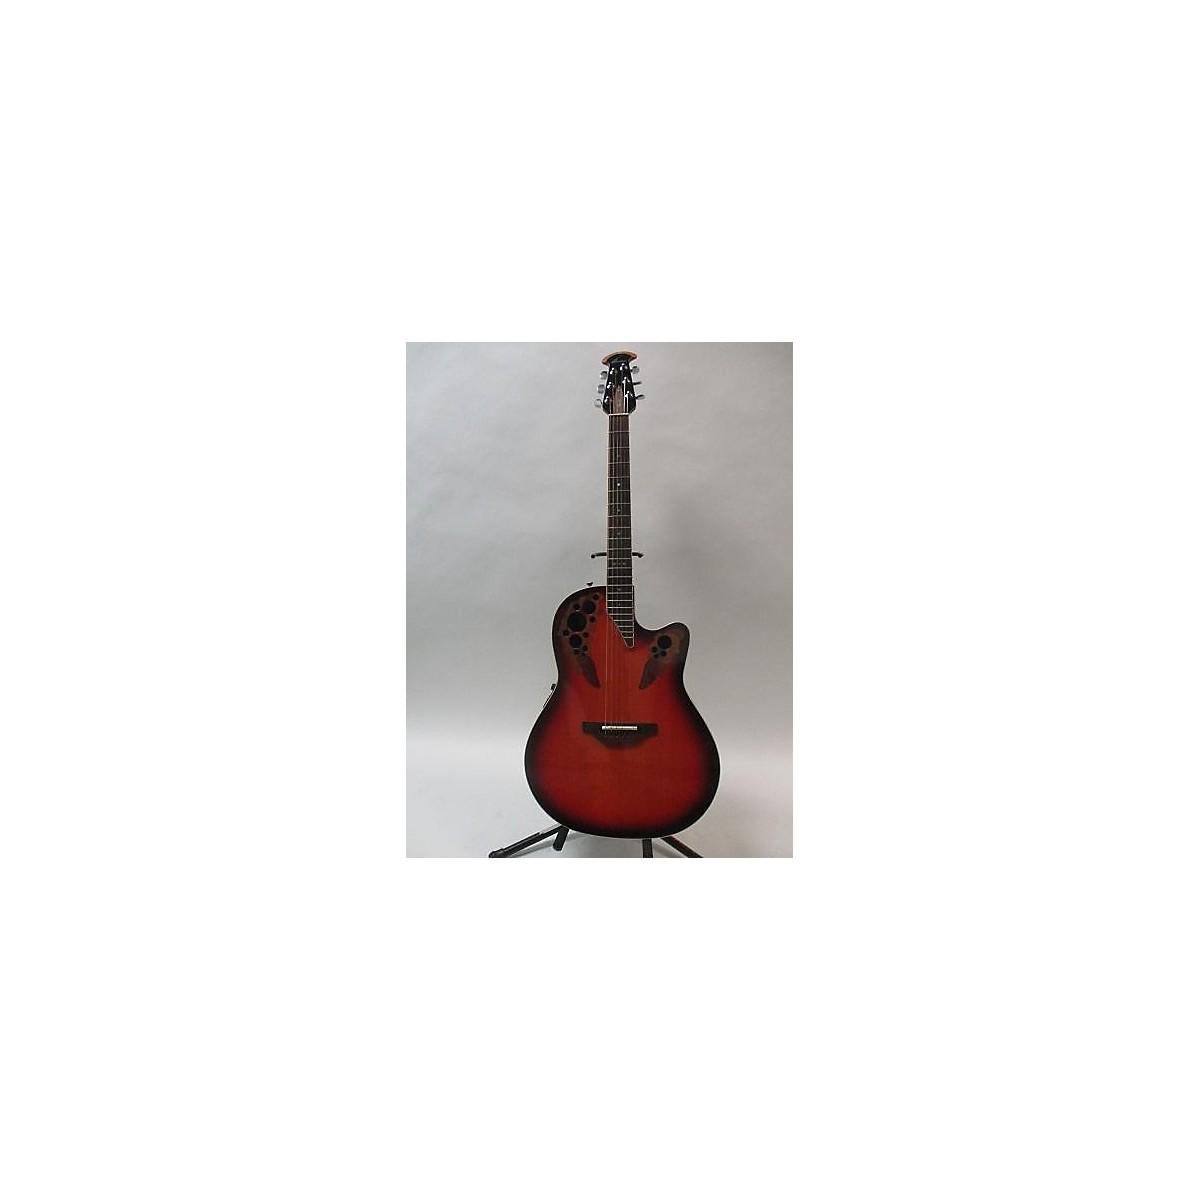 Ovation 6778LX-Standard Elite LX Acoustic Electric Guitar